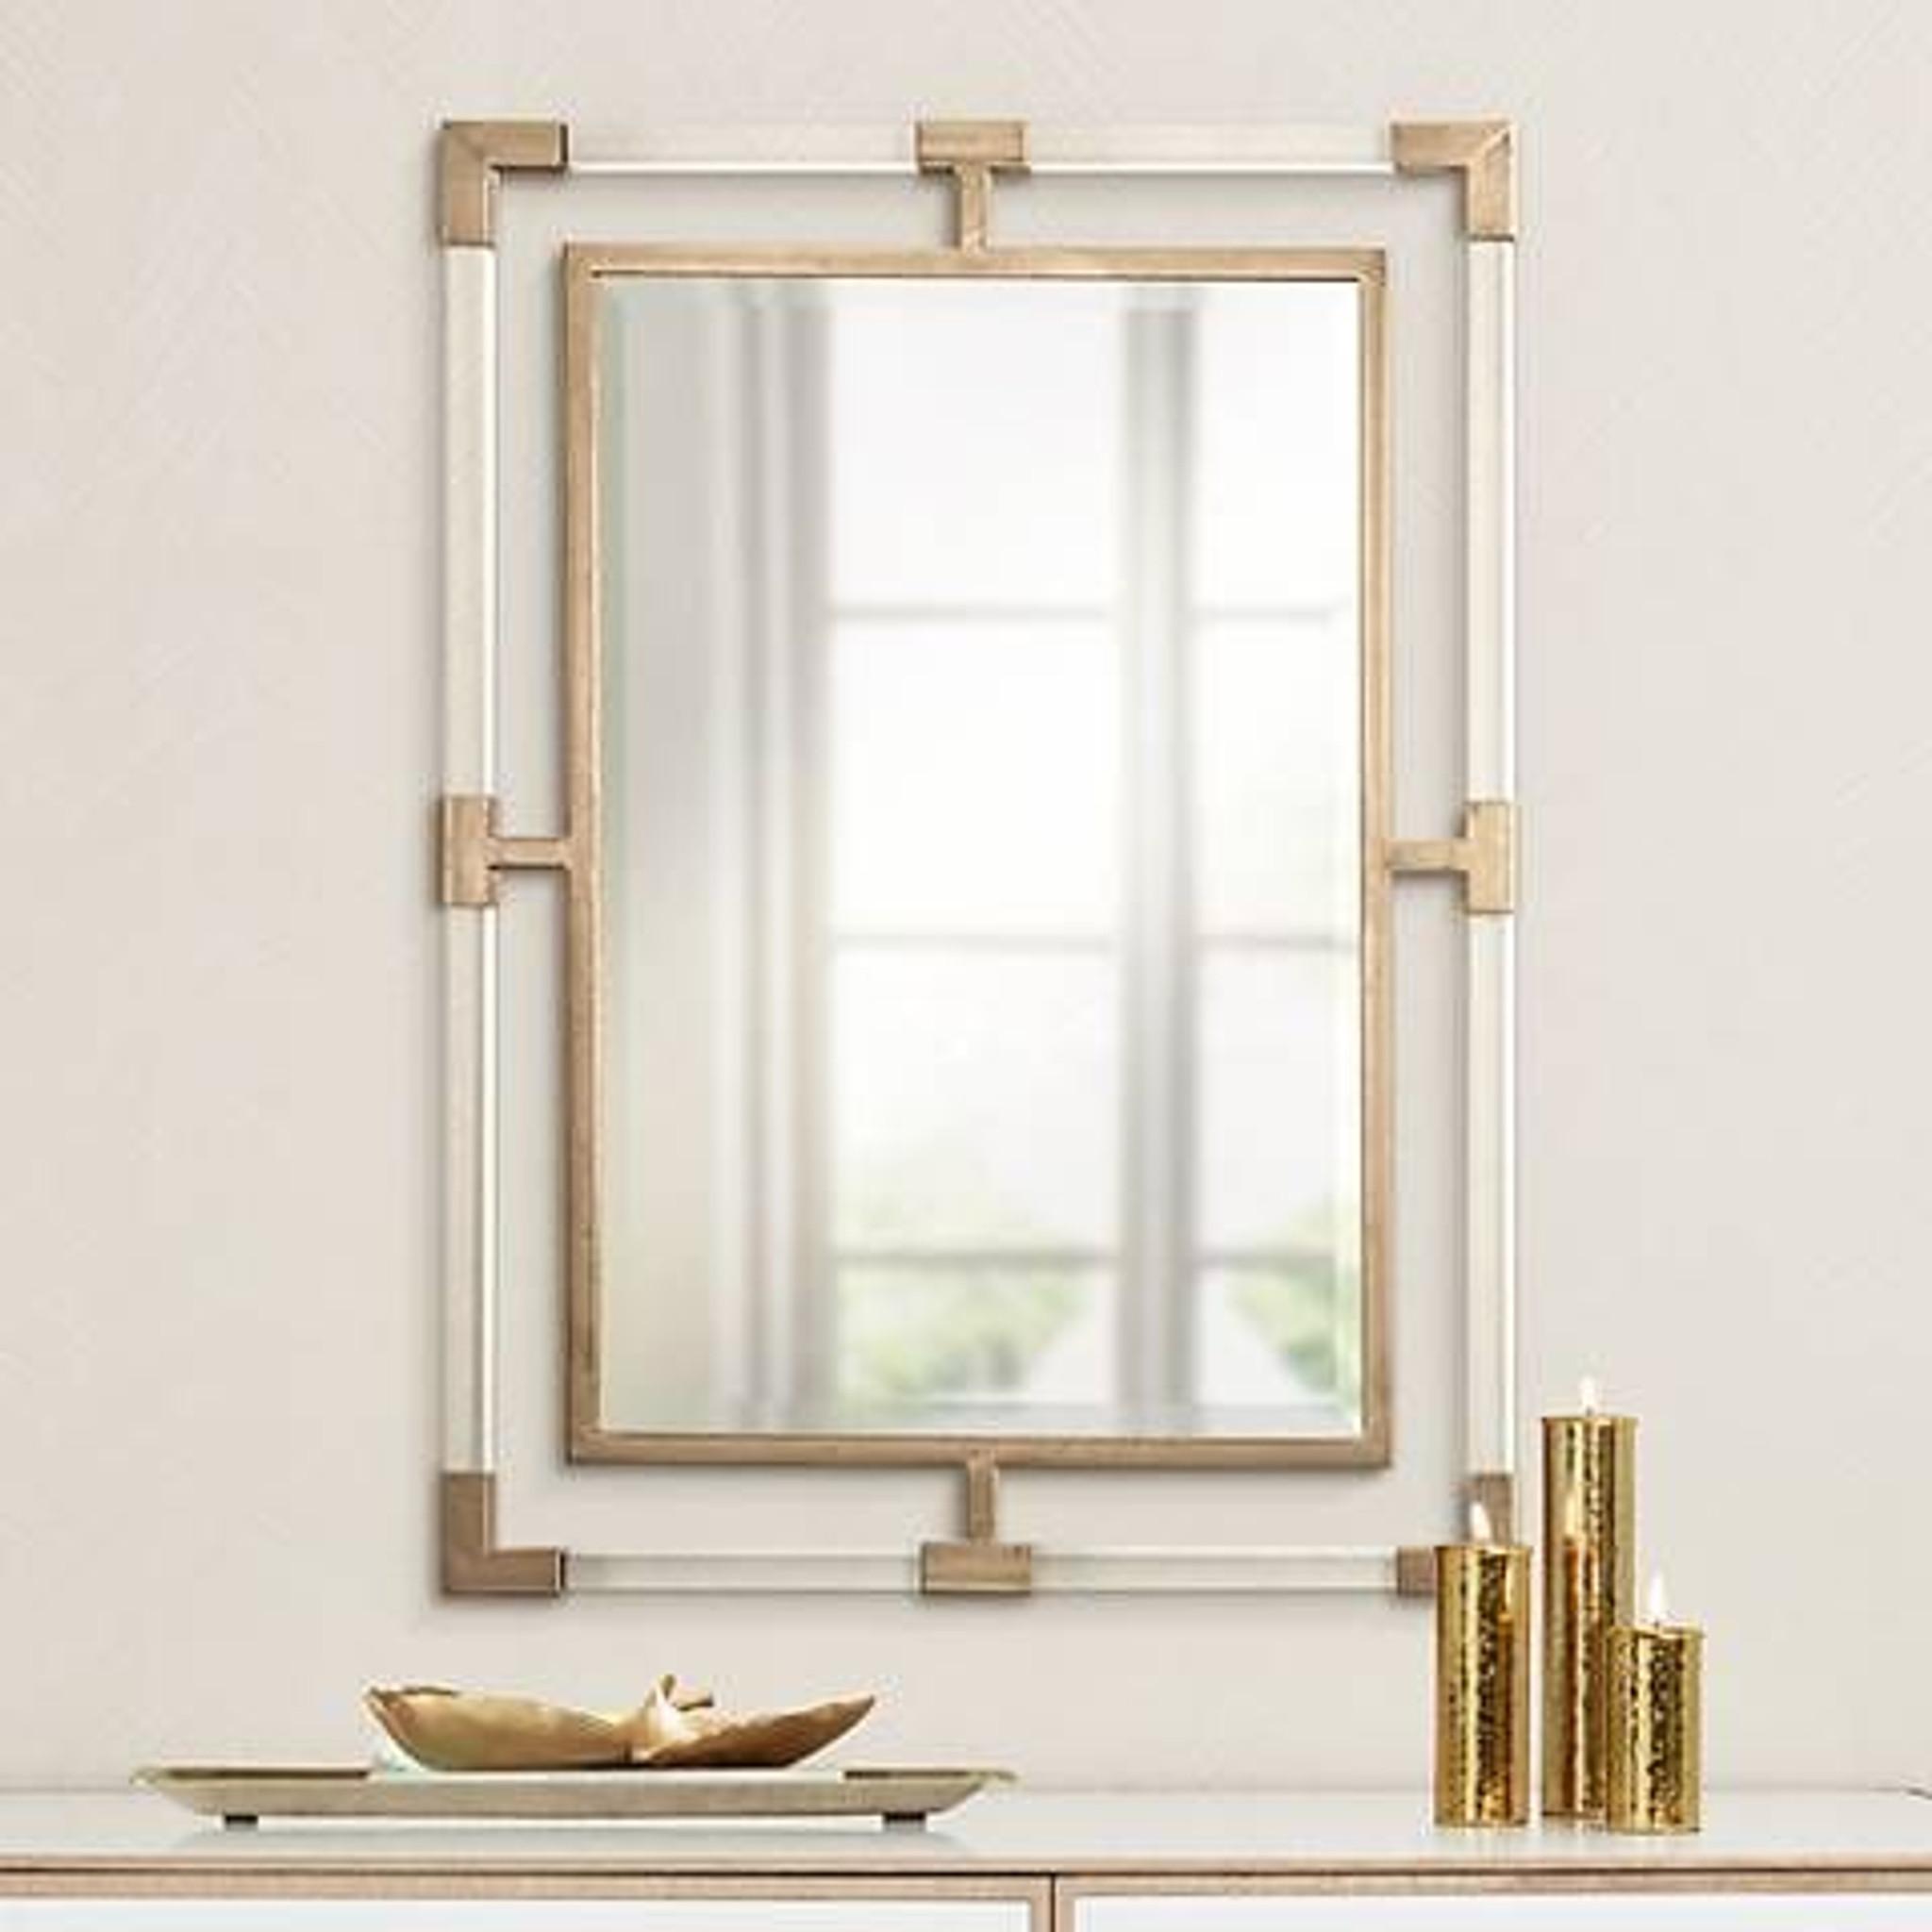 uttermost Balkan Mirror gold acrylic brass accents lucite rectangular modern glam